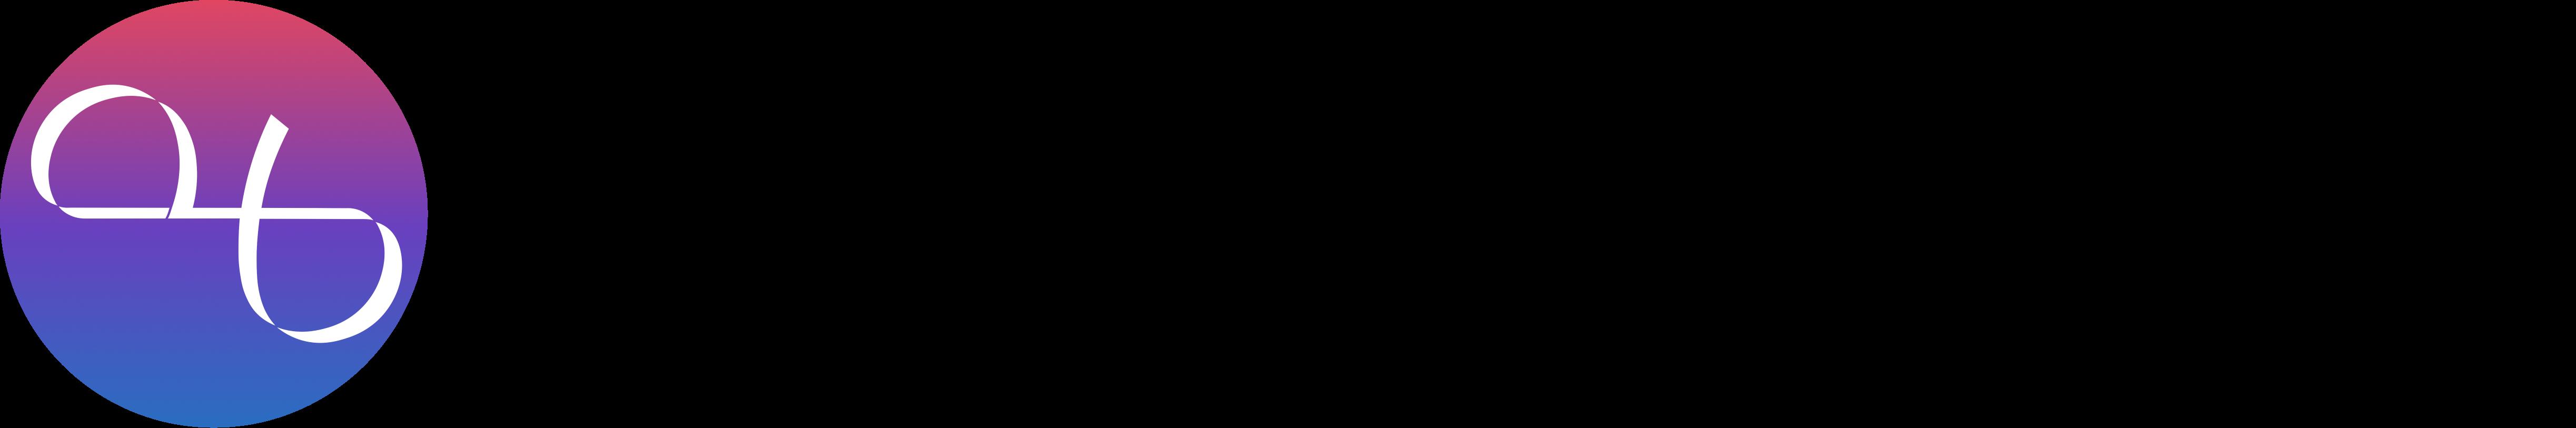 Code4Community logo